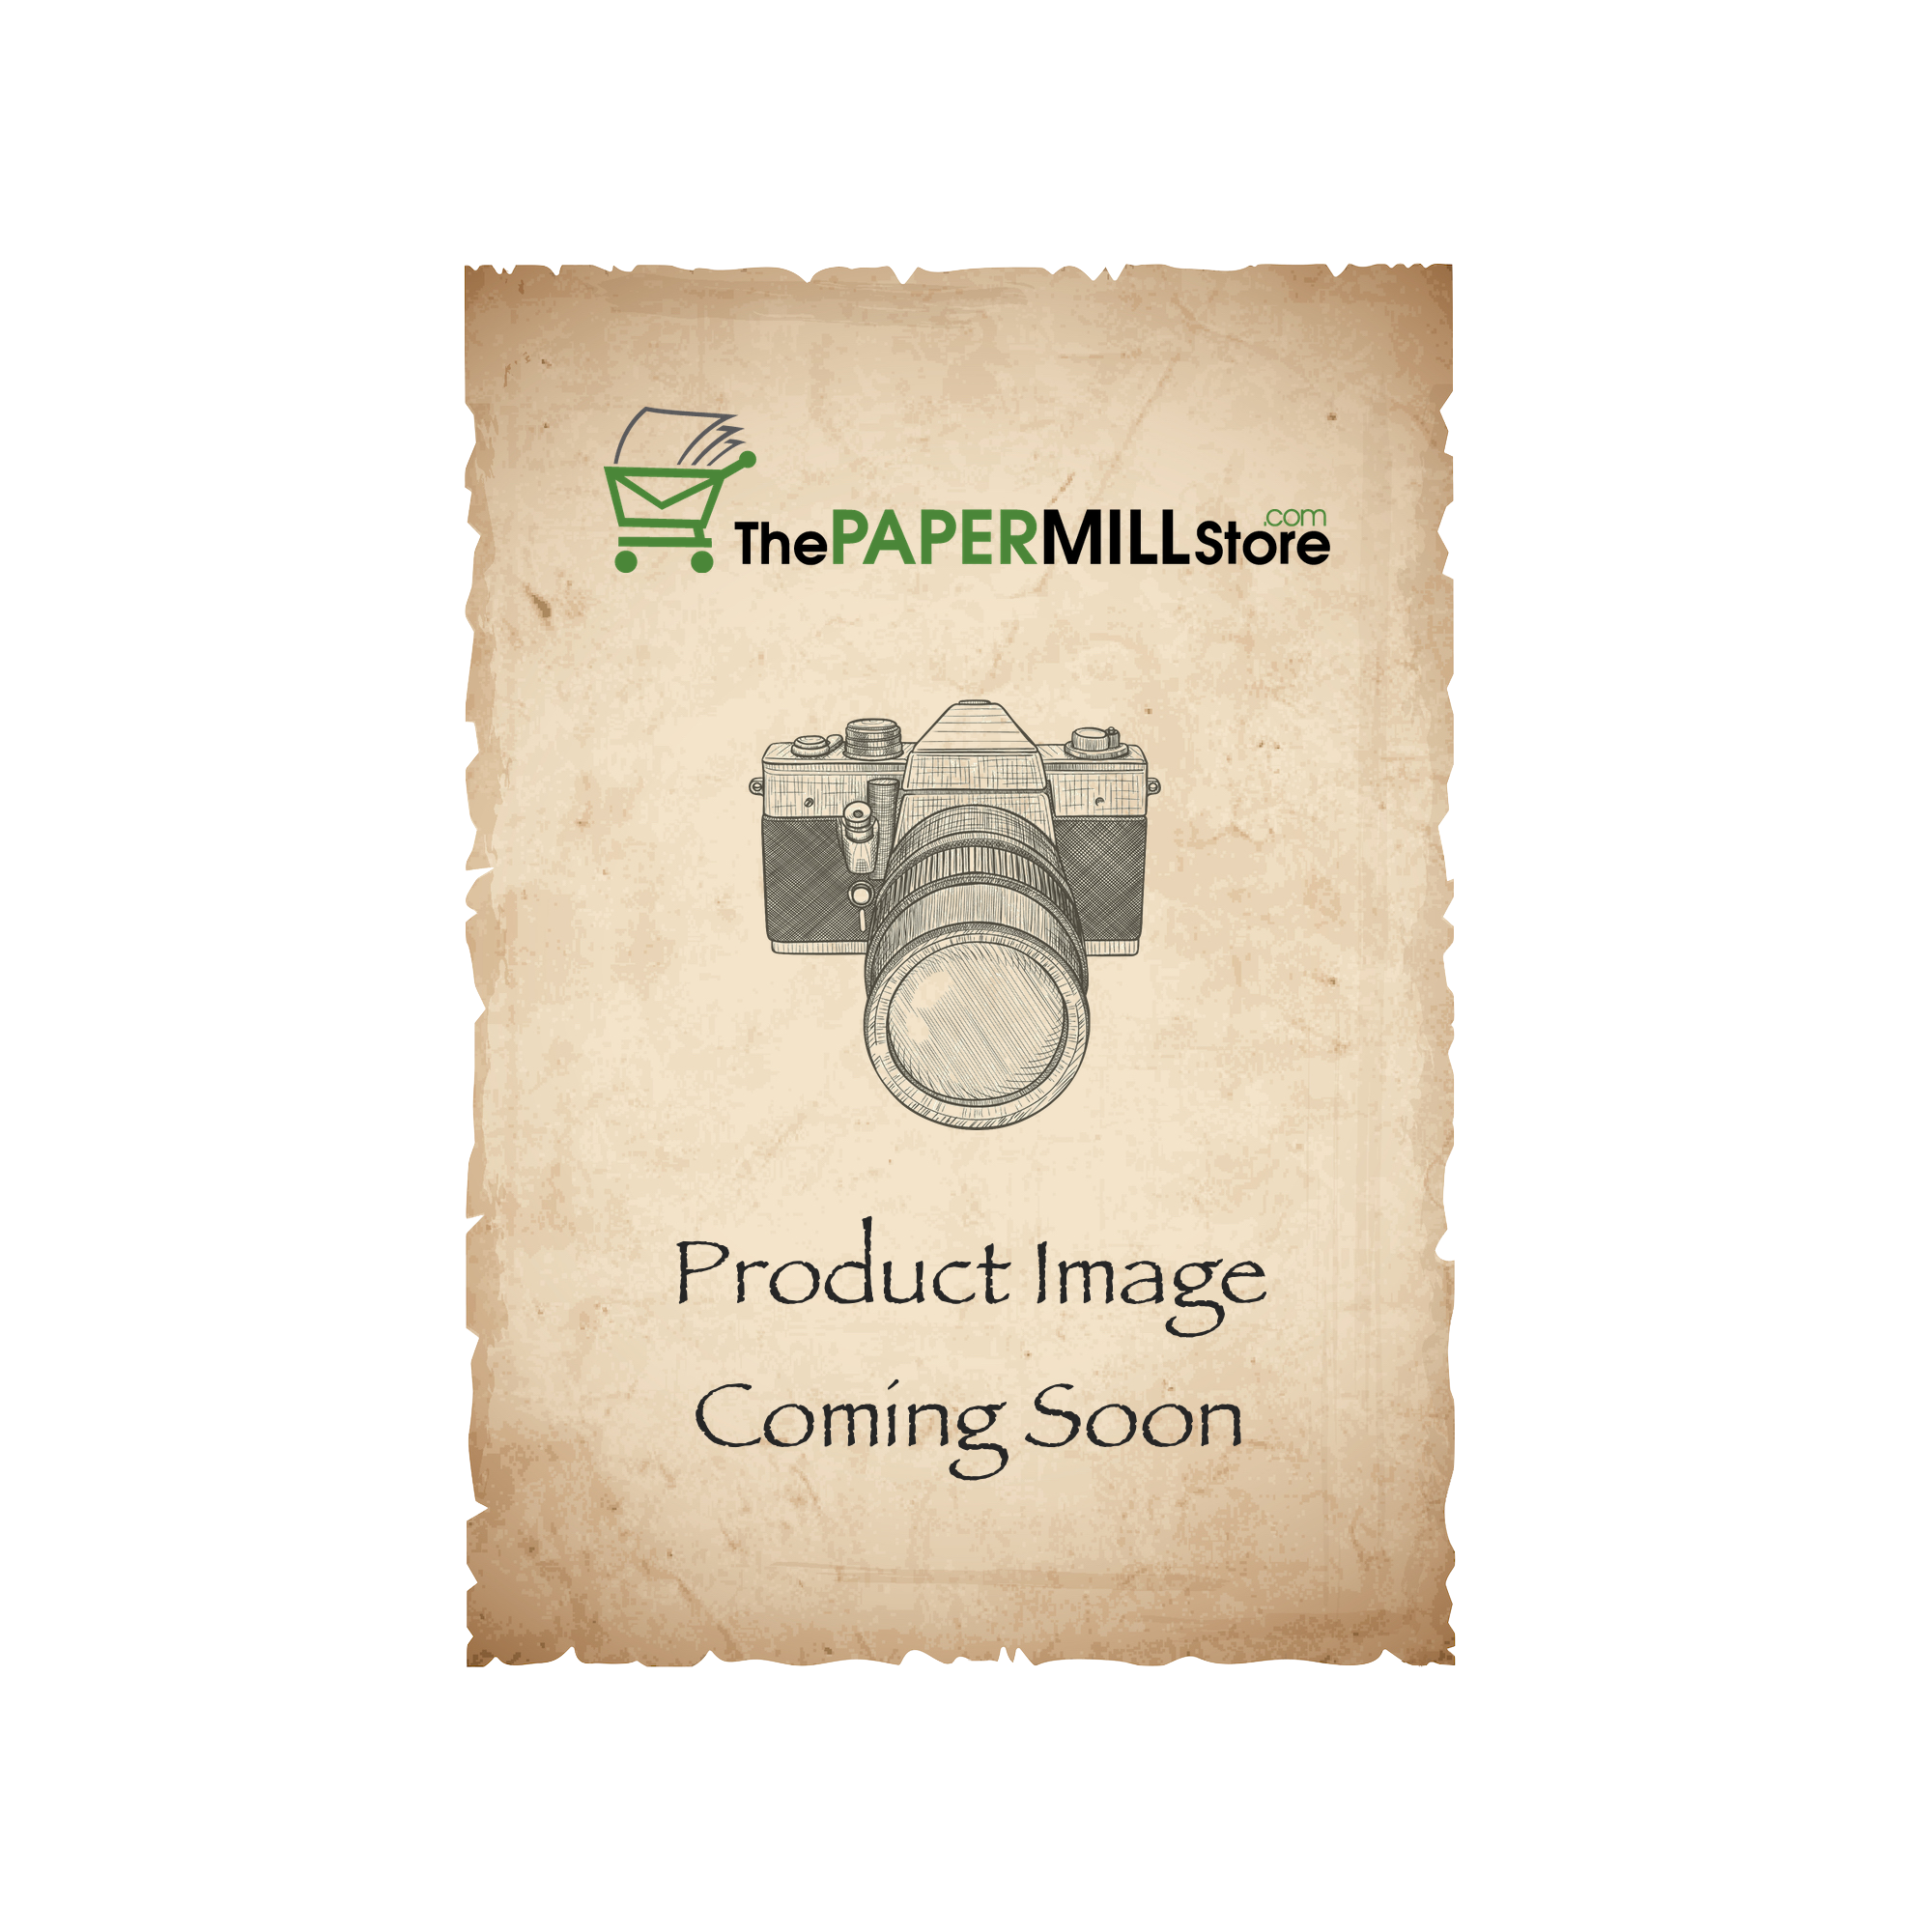 Royal Sundance Cream Envelopes - A8 (5 1/2 x 8 1/8) 70 lb Text Fiber  30% Recycled 250 per Box